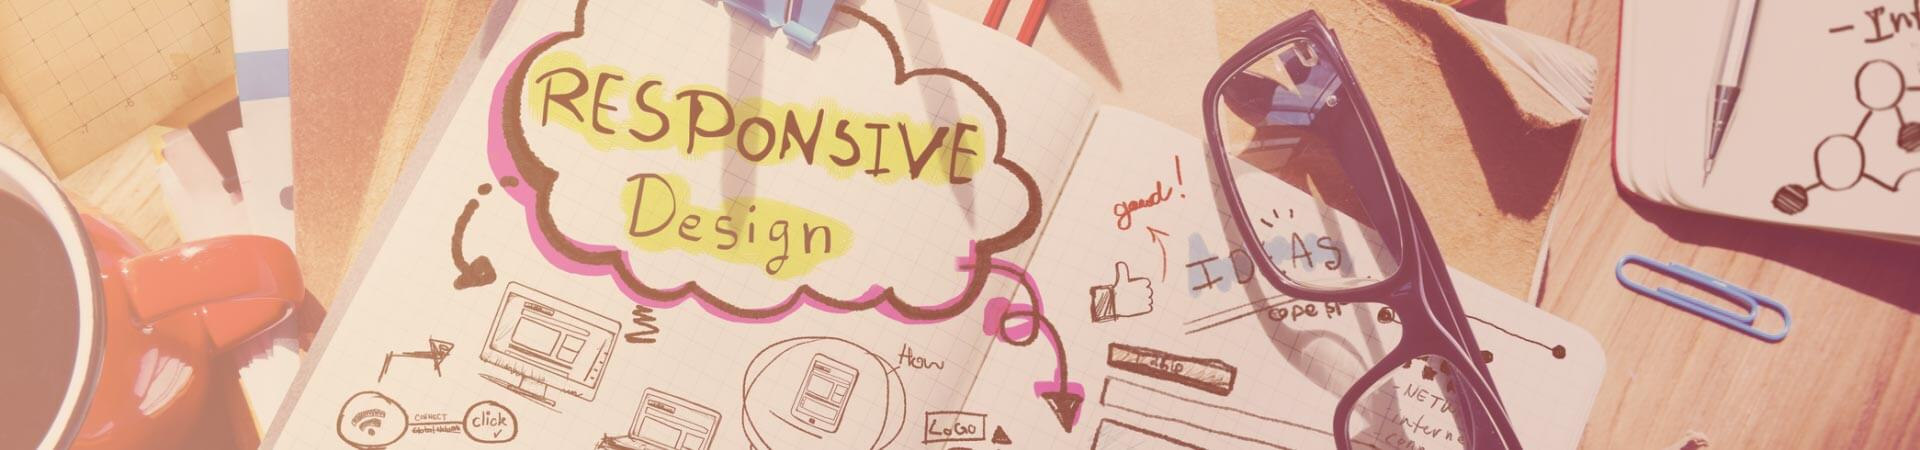 Master mediendesign hochschulen studieng nge for Mediendesign fernstudium